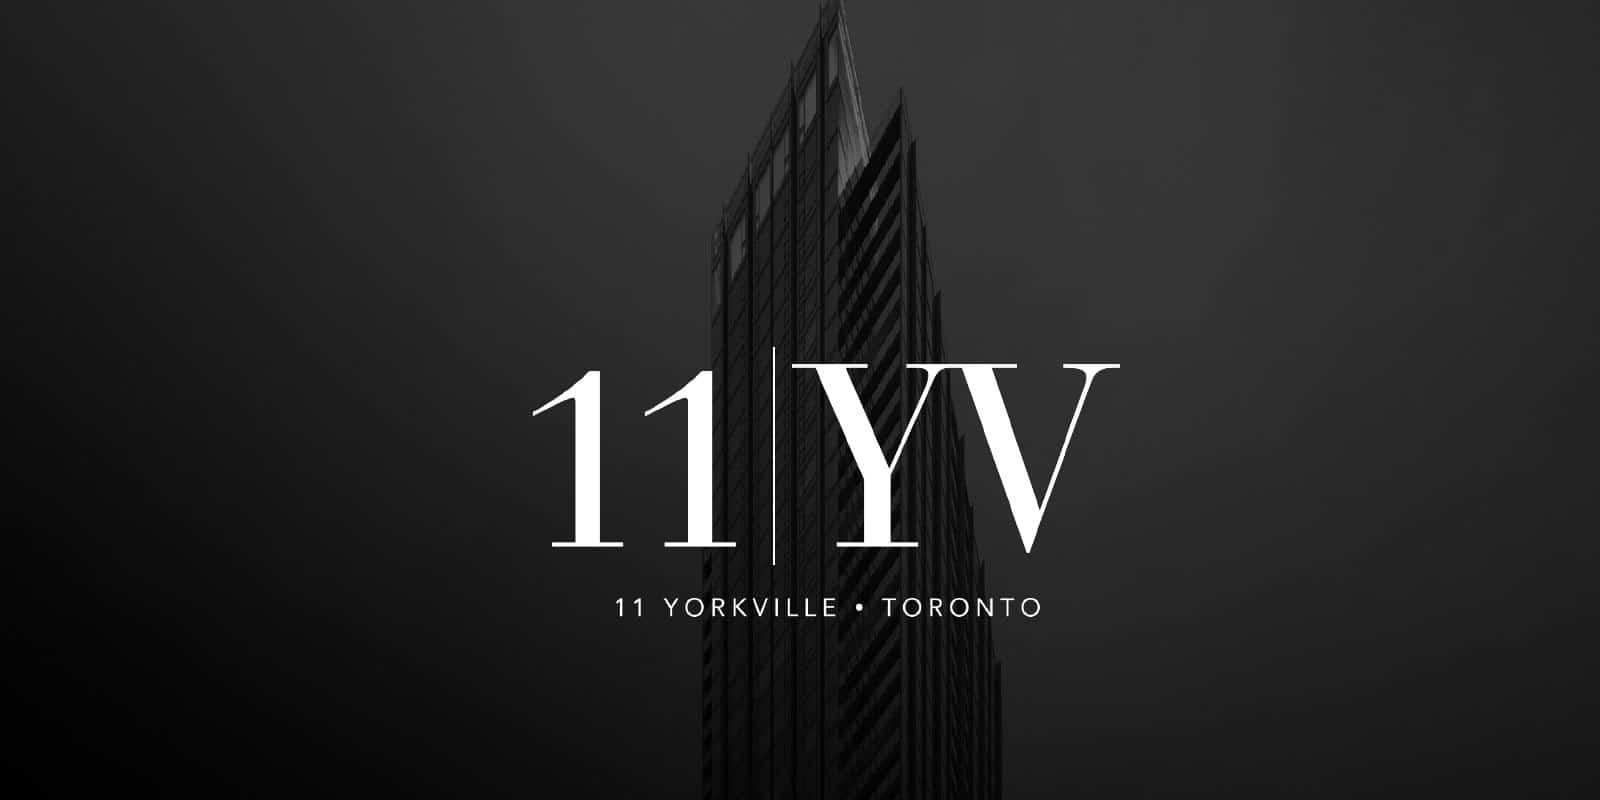 11|YV - 11 Yorkville Condos